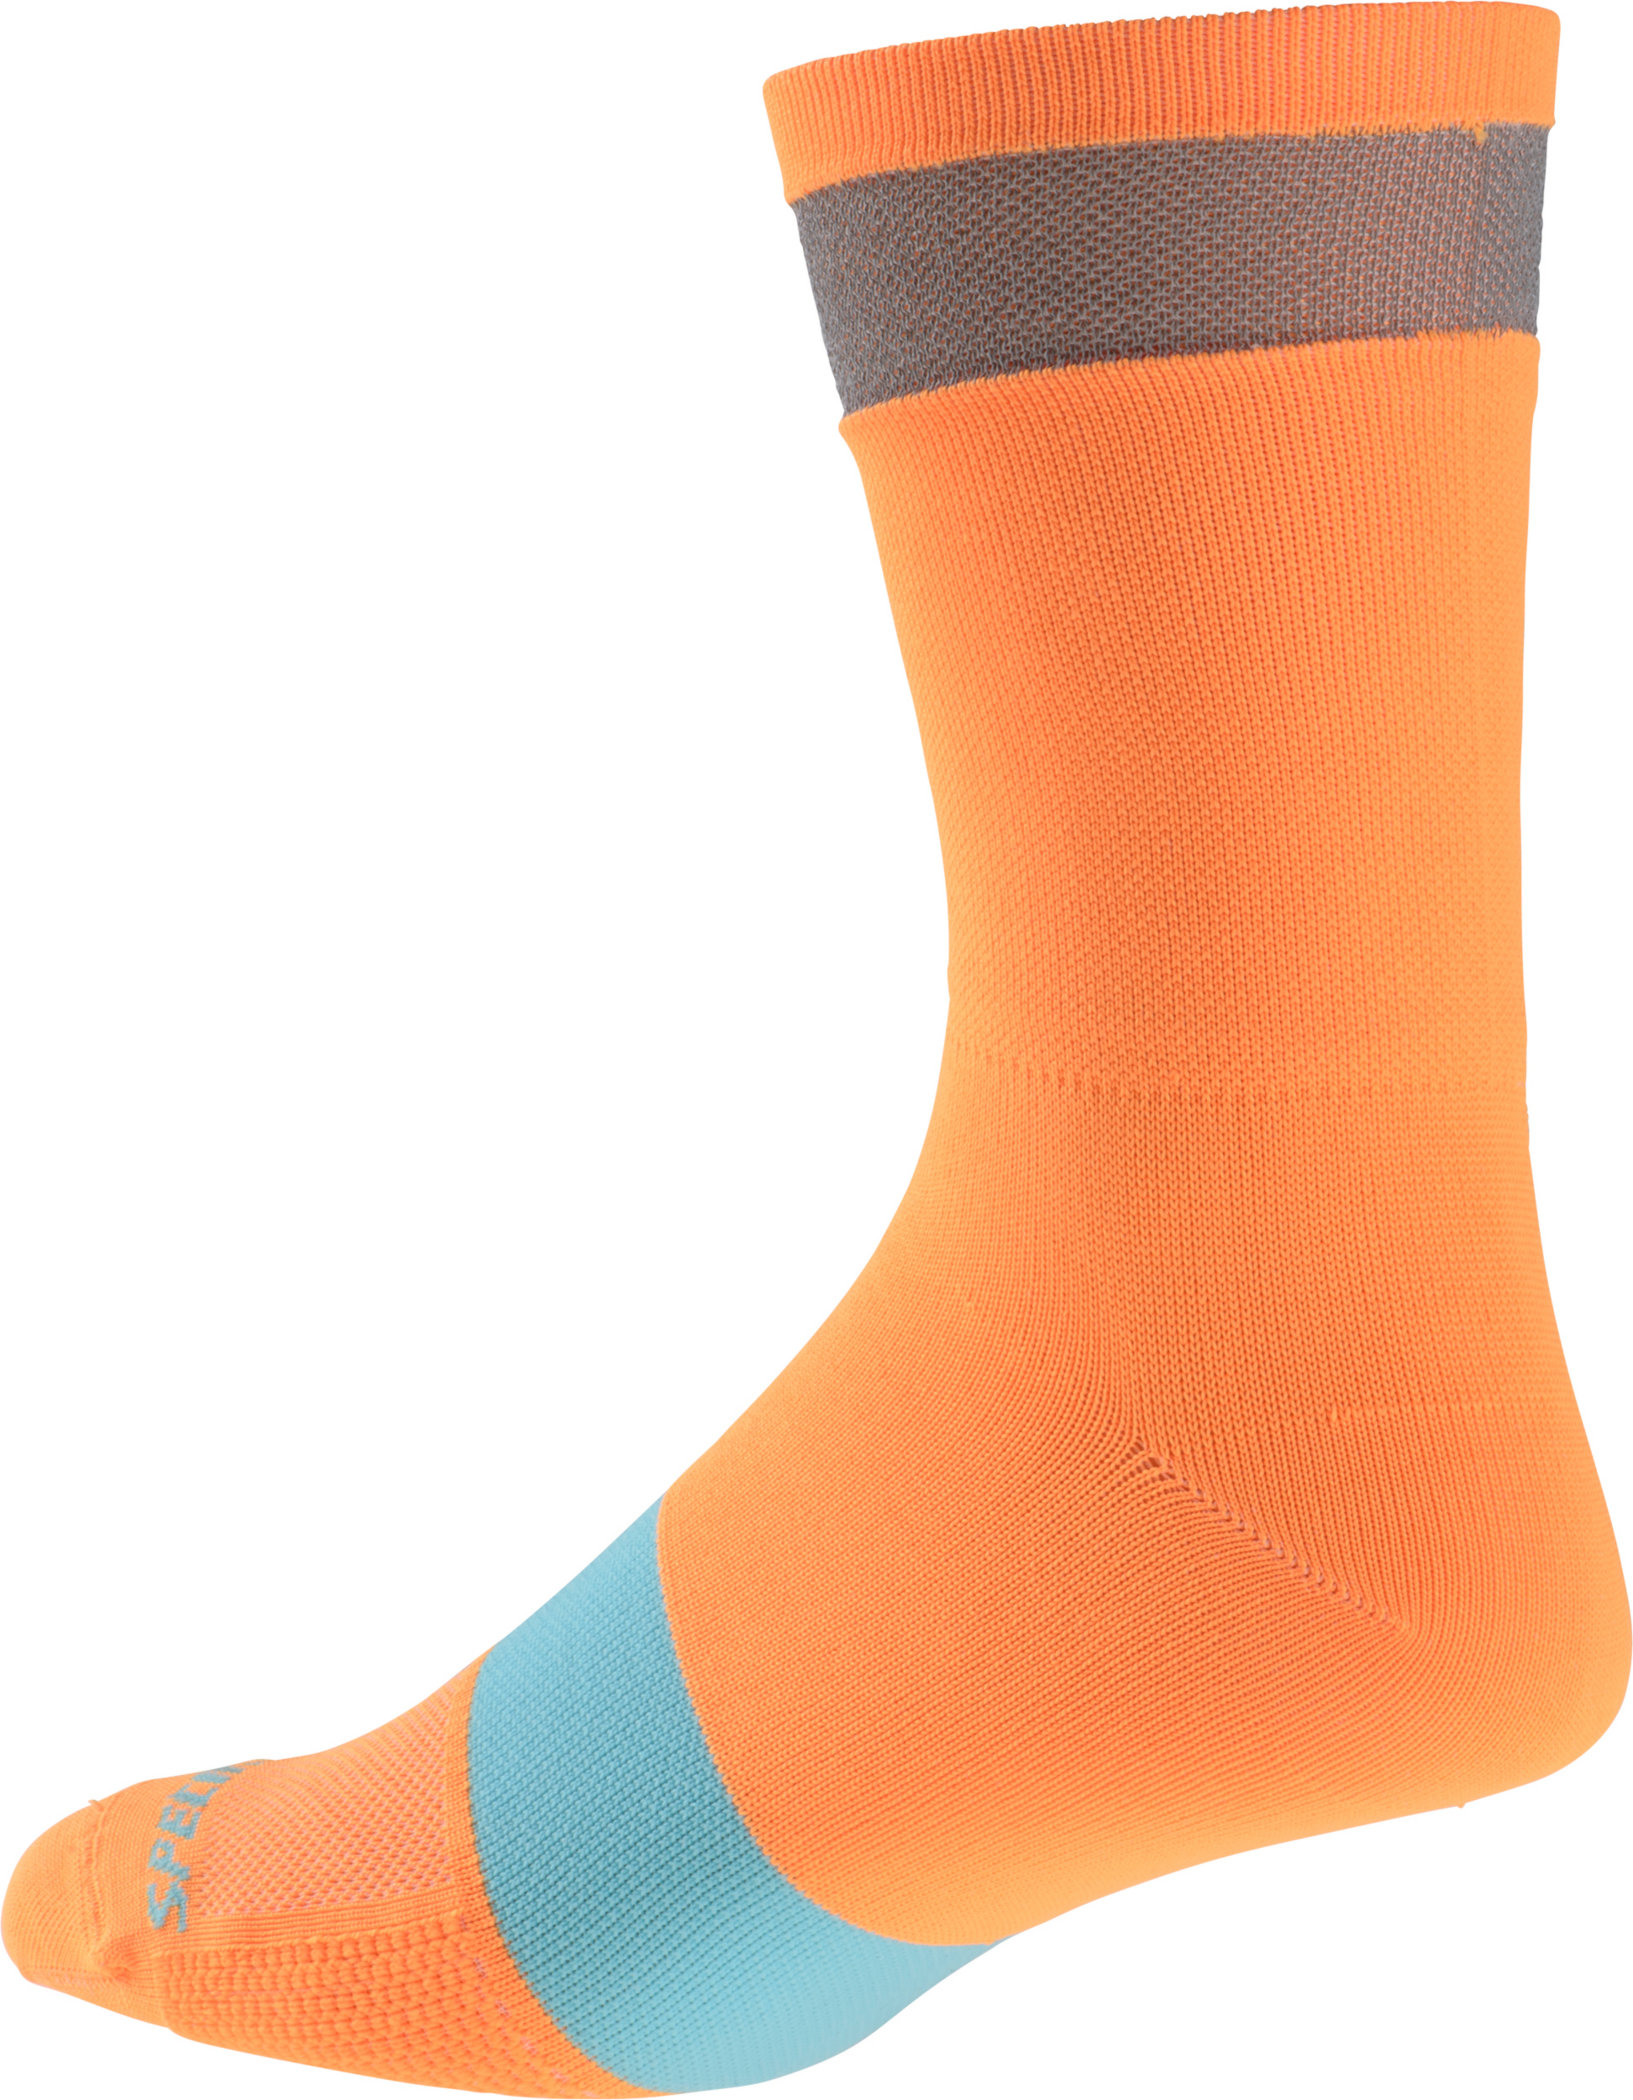 Specialized Reflect Tall Socks Neon Orange Large/X-Large - Alpha Bikes